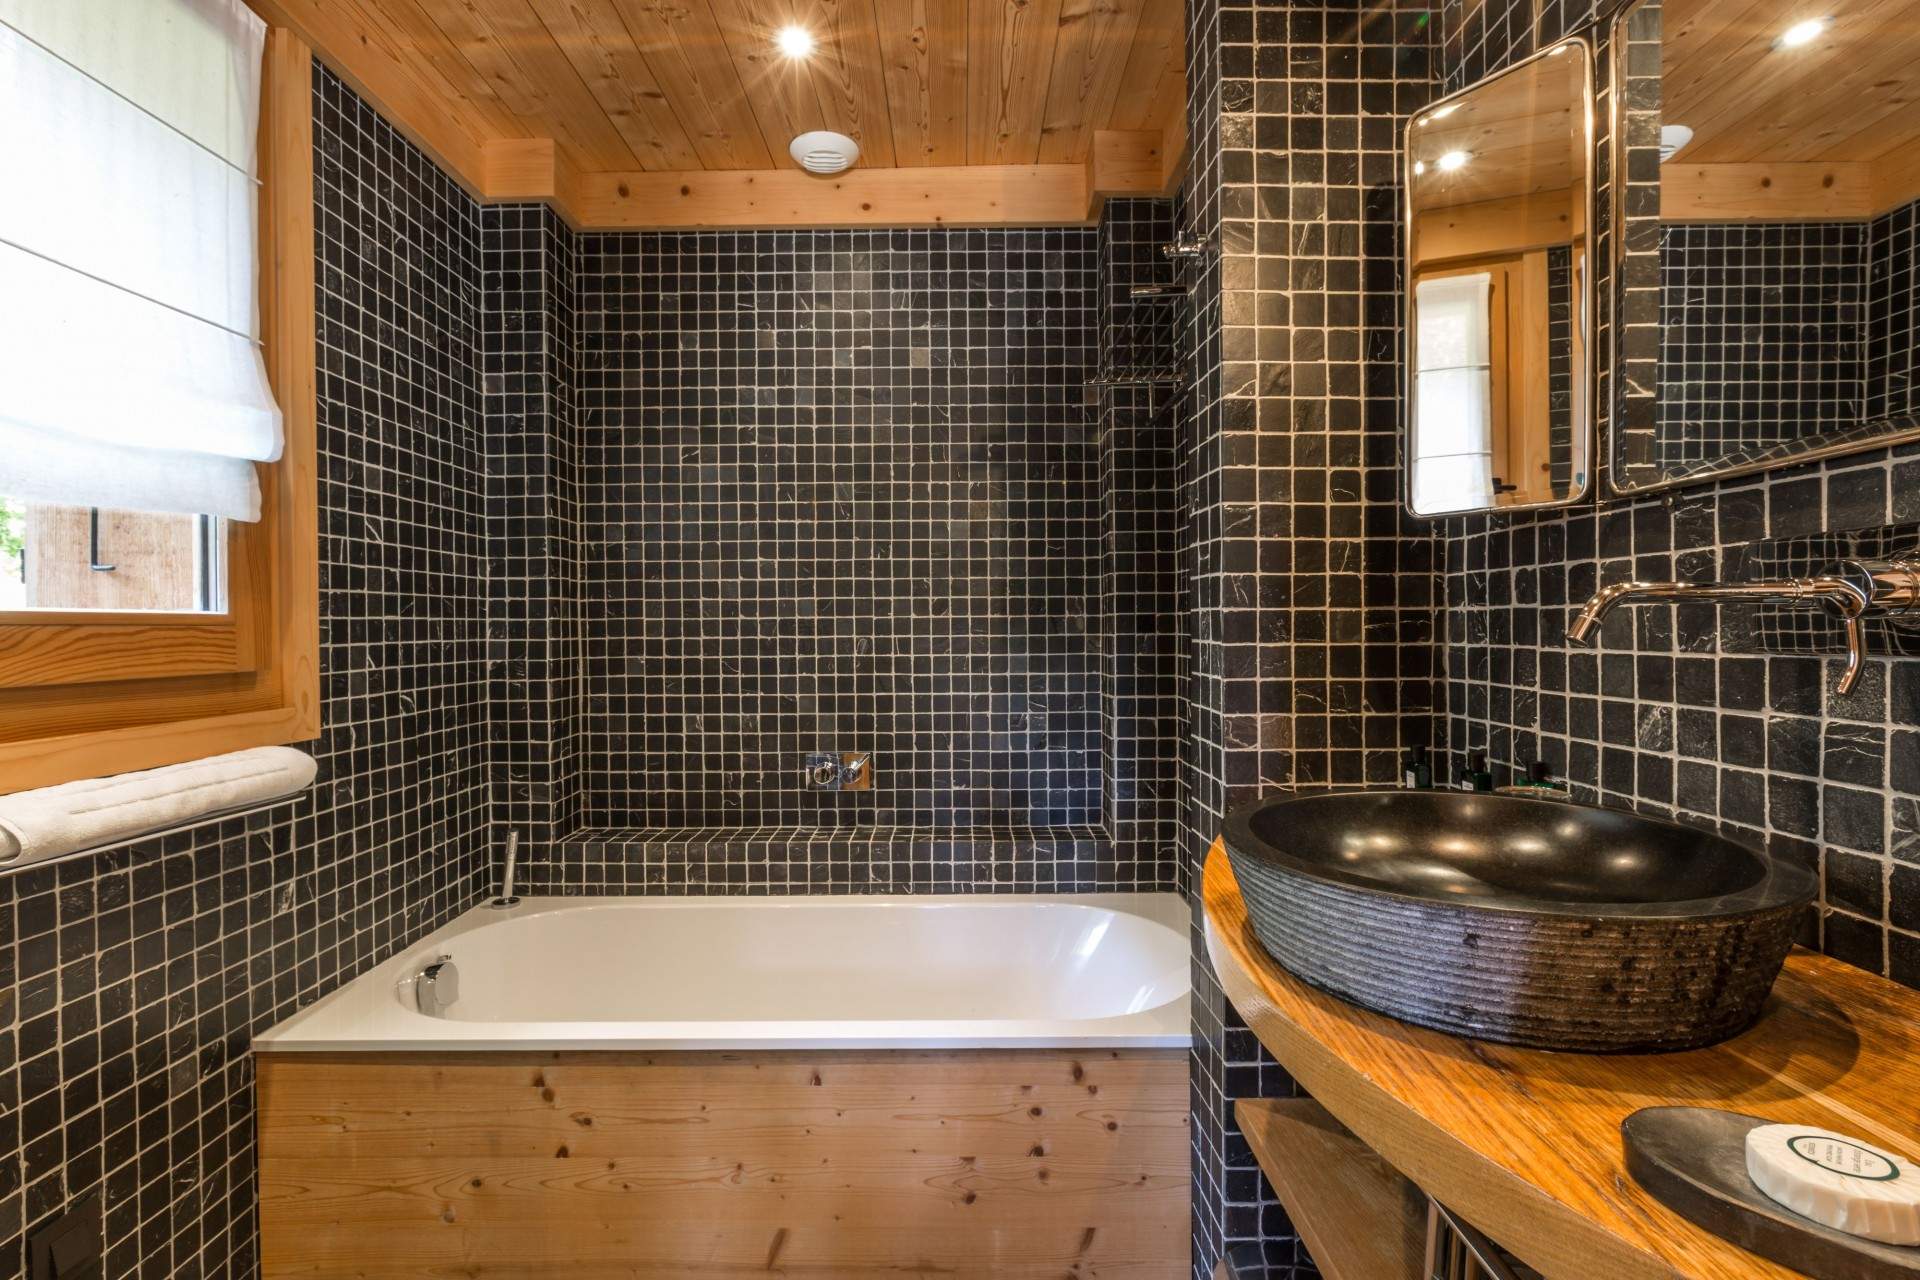 Argentière Location Chalet Luxe Calderite Chambre2 Sdb